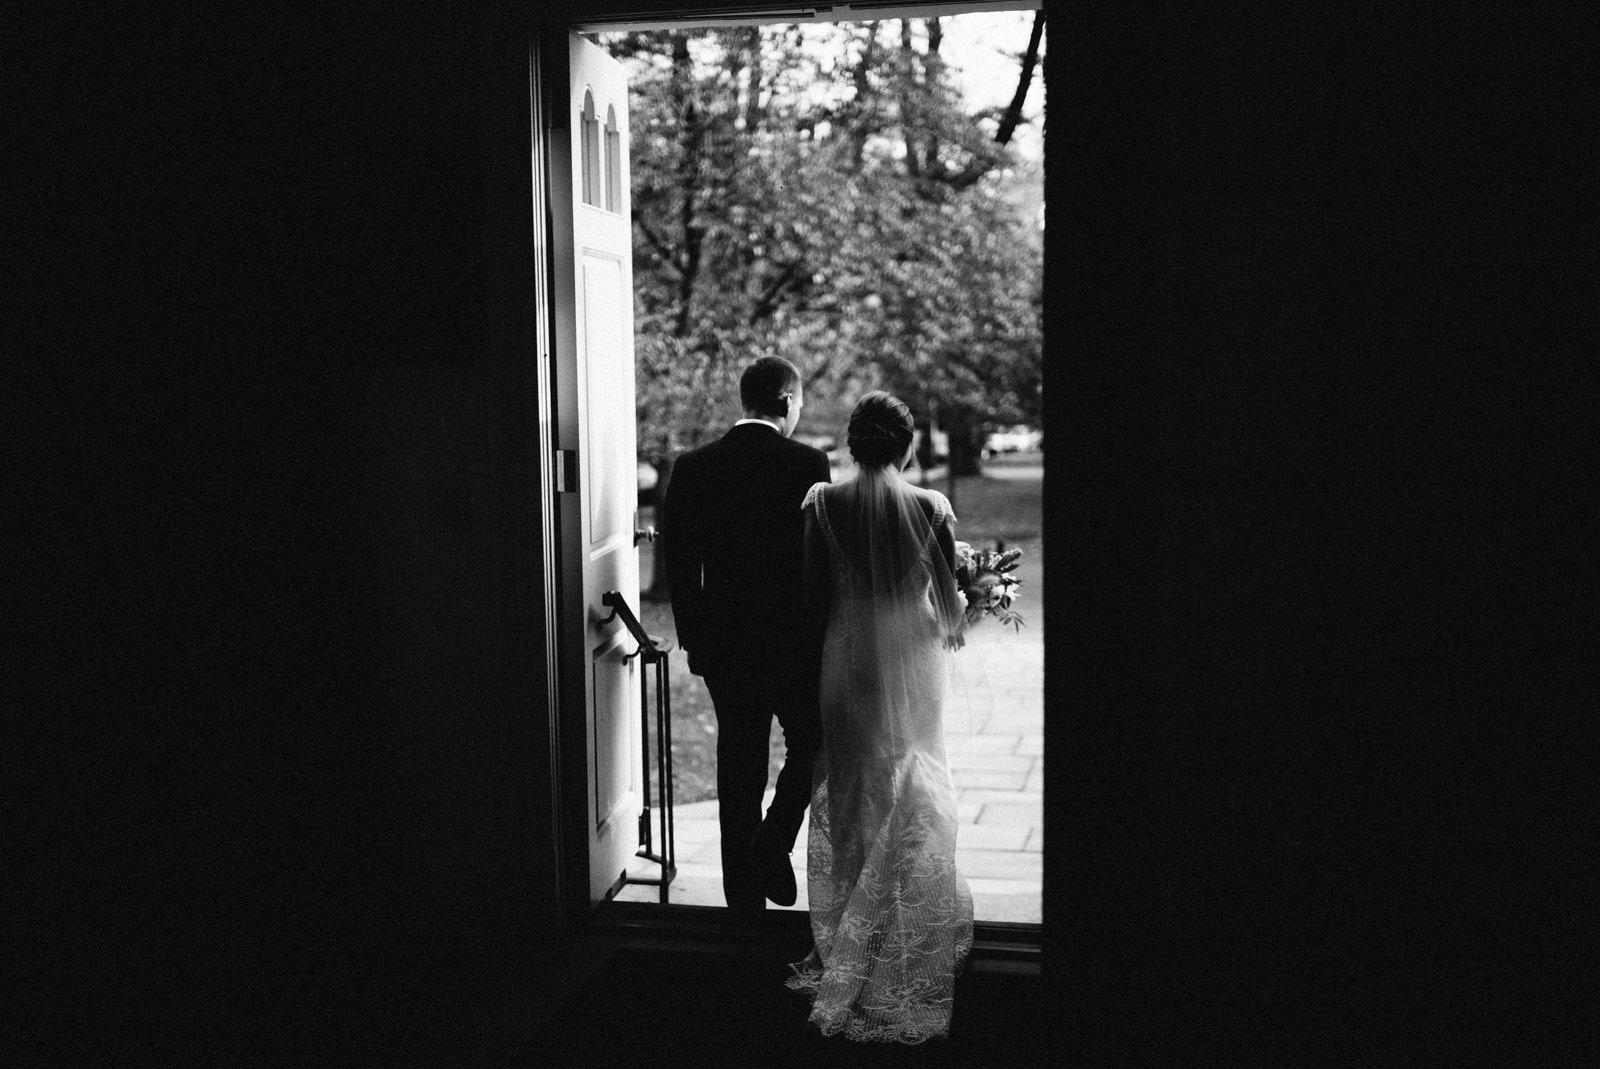 bridgeport-wedding-083 BRIDGEPORT, CONNECTICUT BACKYARD WEDDING